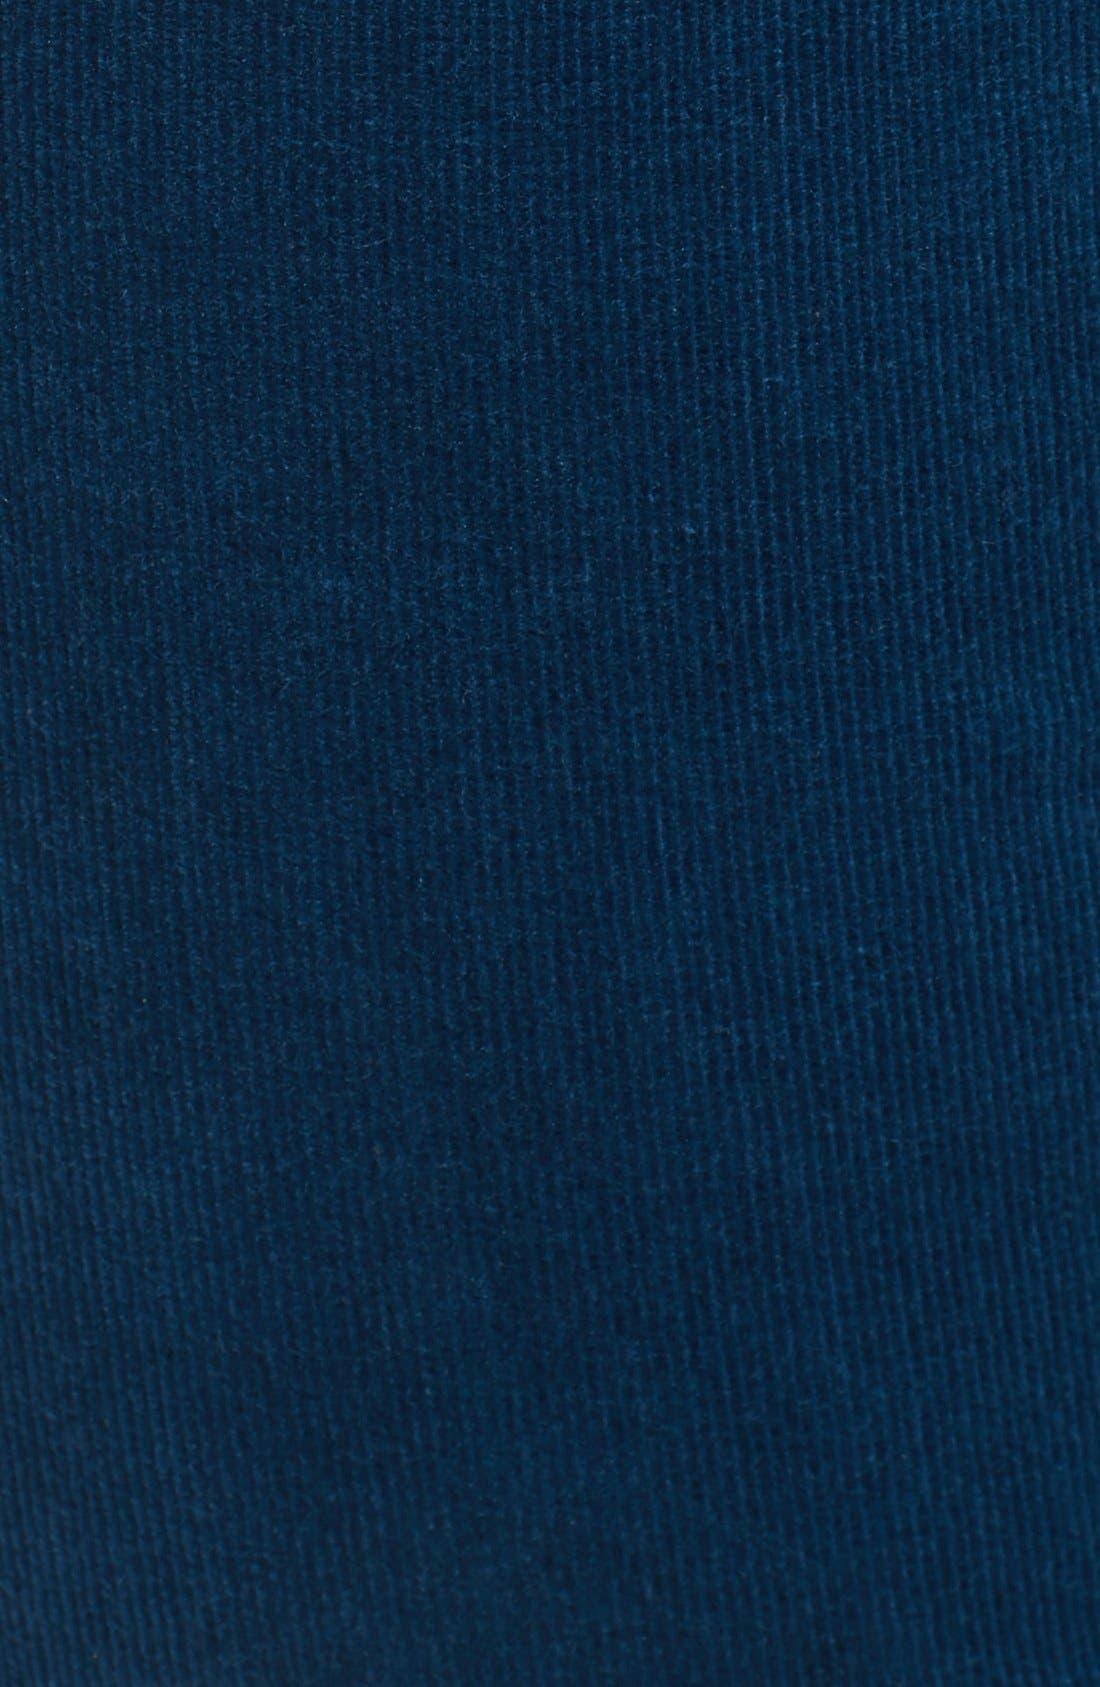 'Diana' Stretch Corduroy Skinny Pants,                             Alternate thumbnail 233, color,